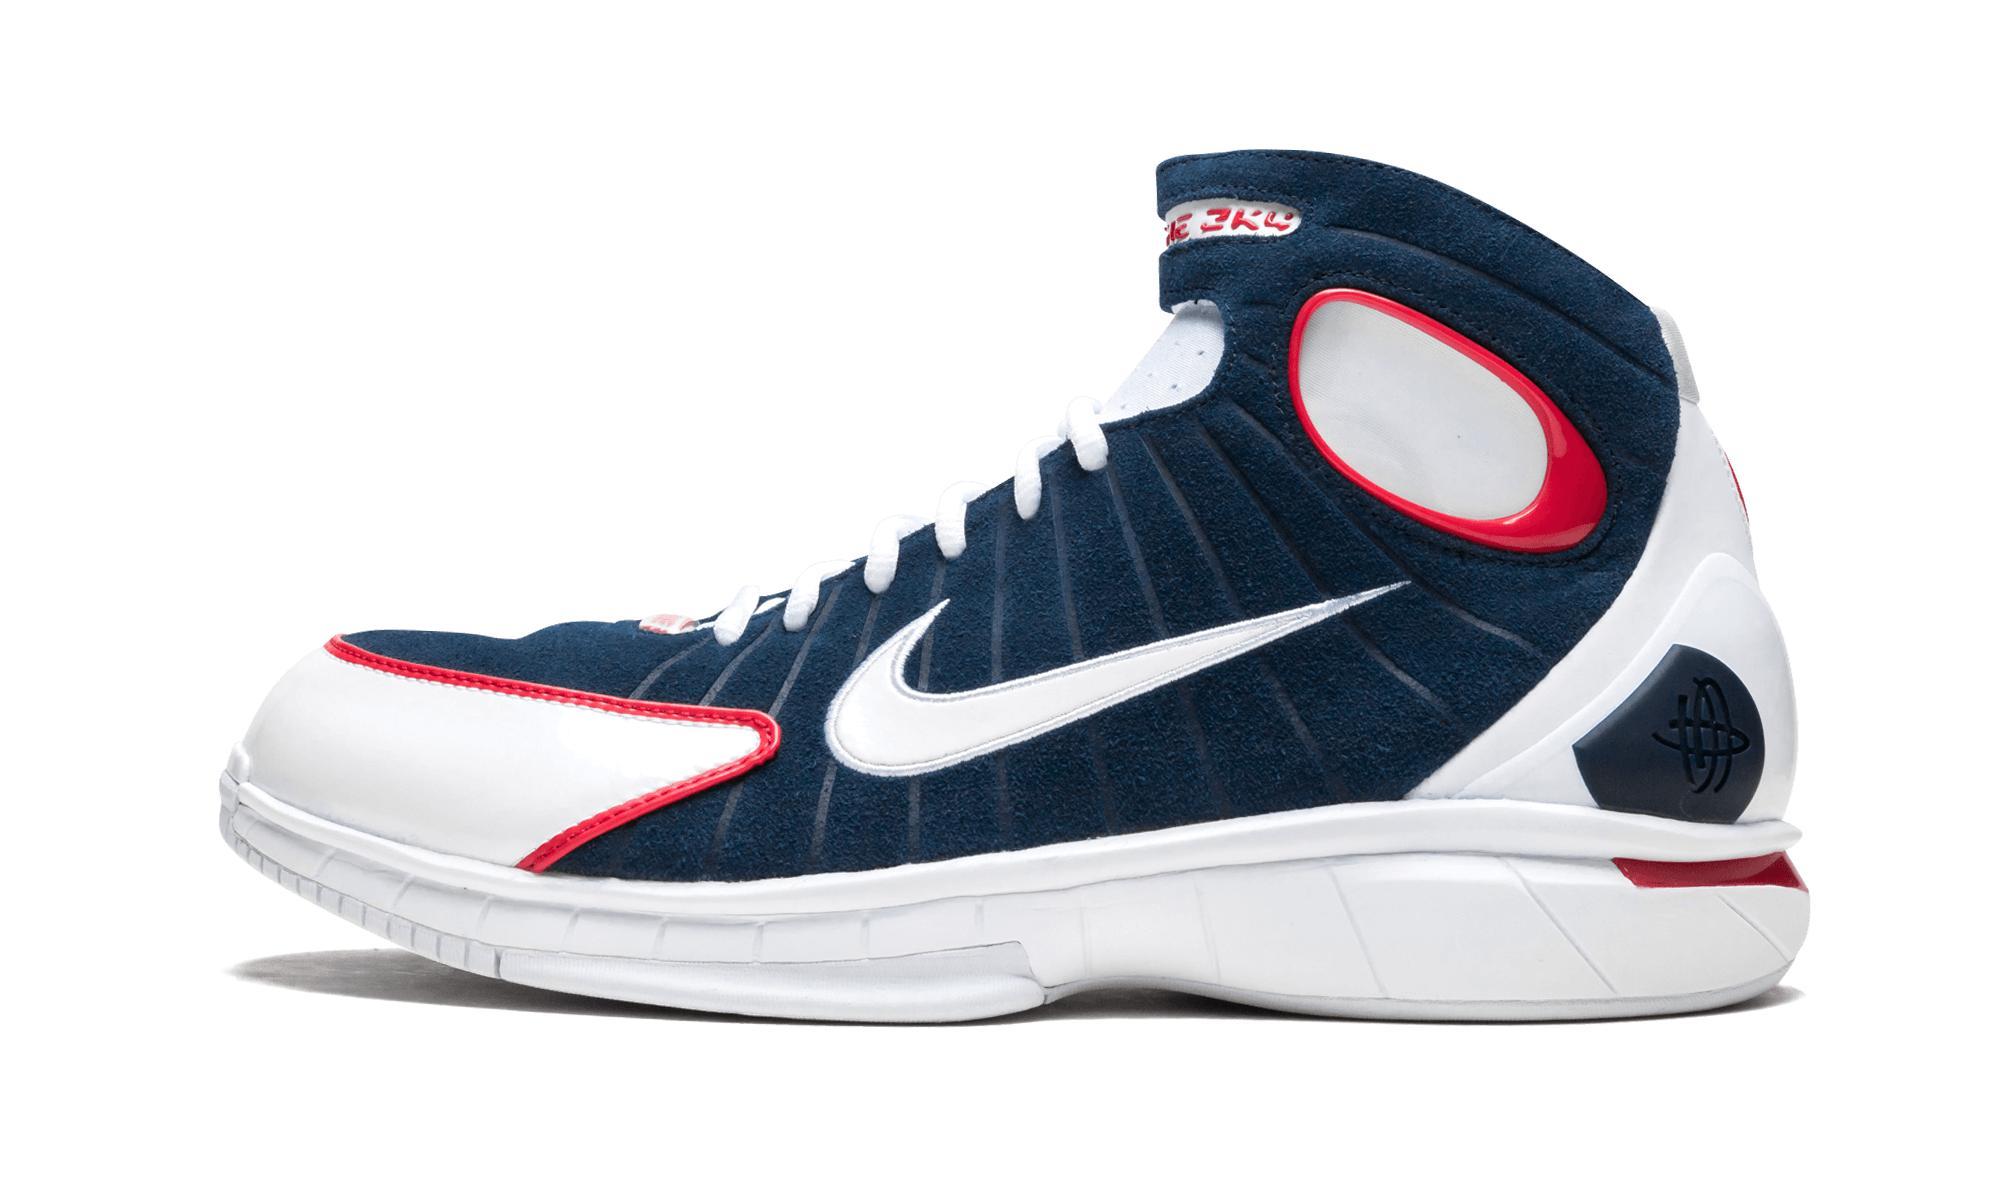 8e93bdc813e Nike Air Zoom Huarache 2k4 in Blue for Men - Lyst